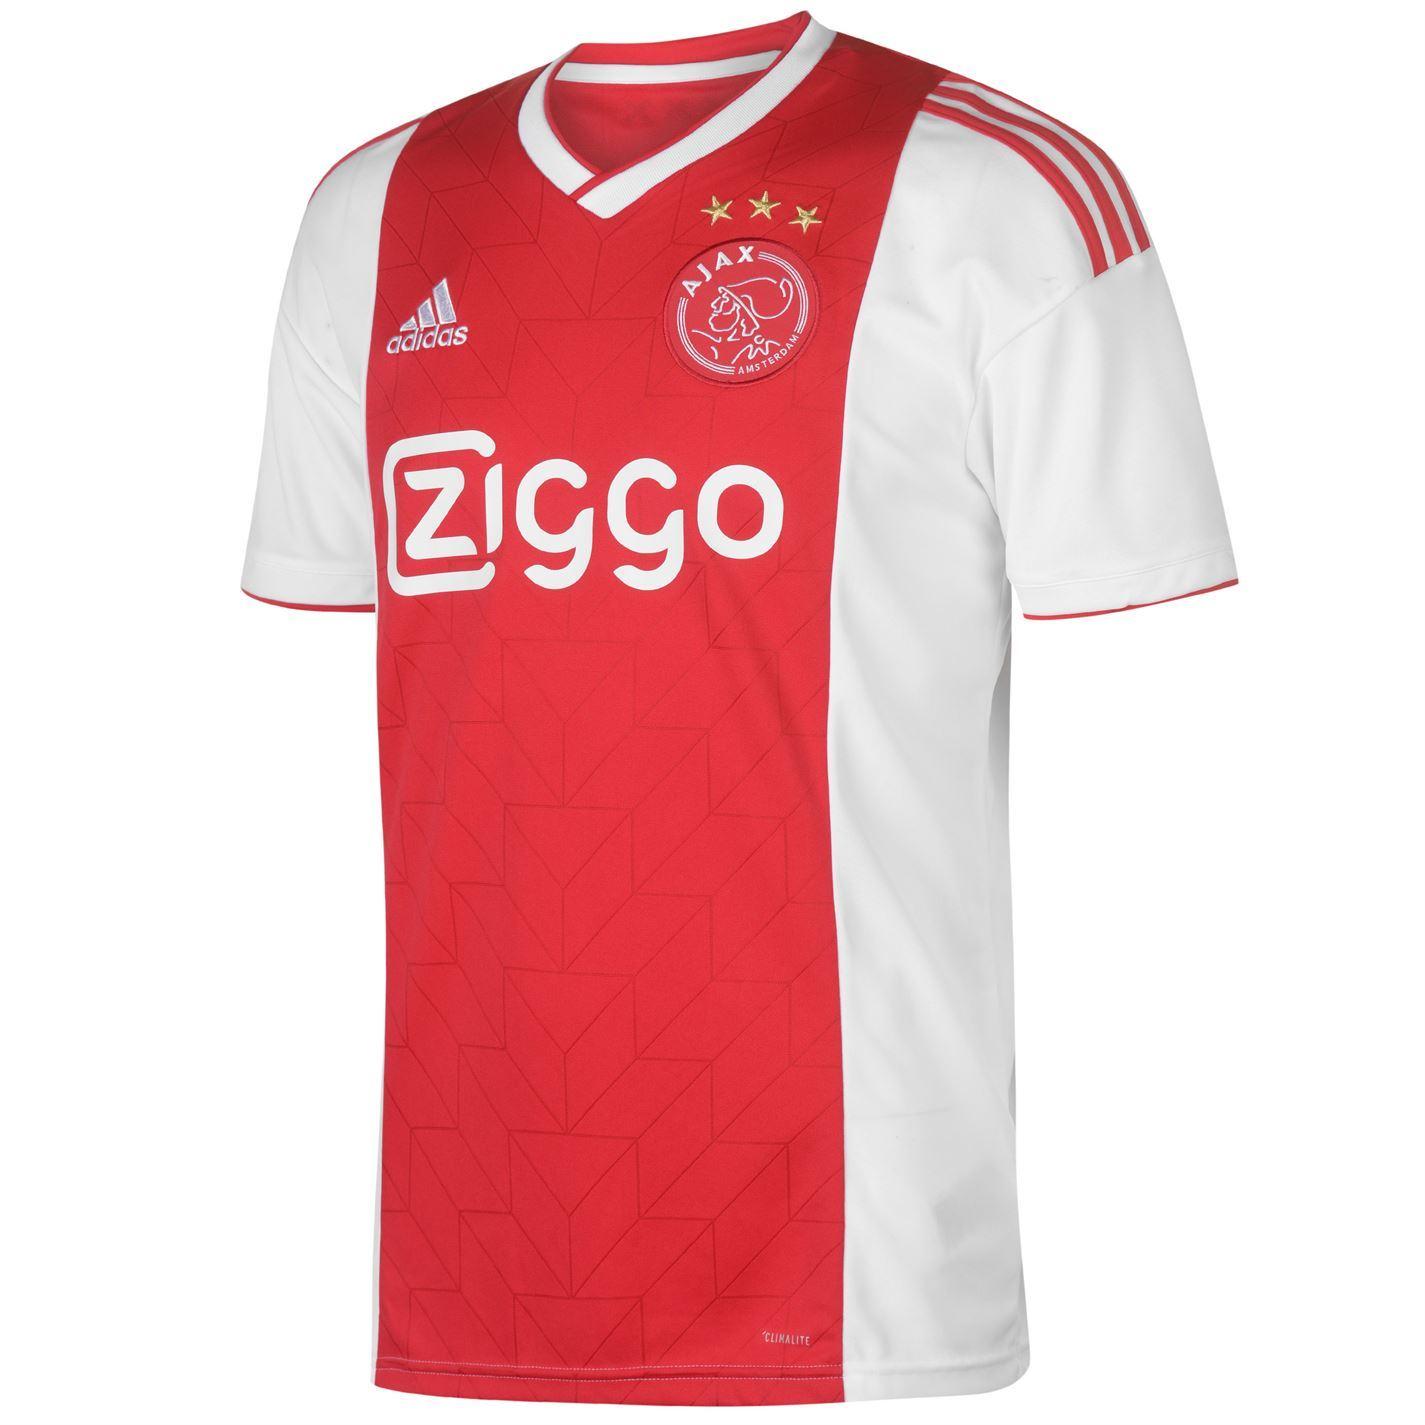 7b1ed385 ... adidas Ajax Home Jersey 2018 2019 Mens Red/White Football Soccer Fan  Shirt Top ...